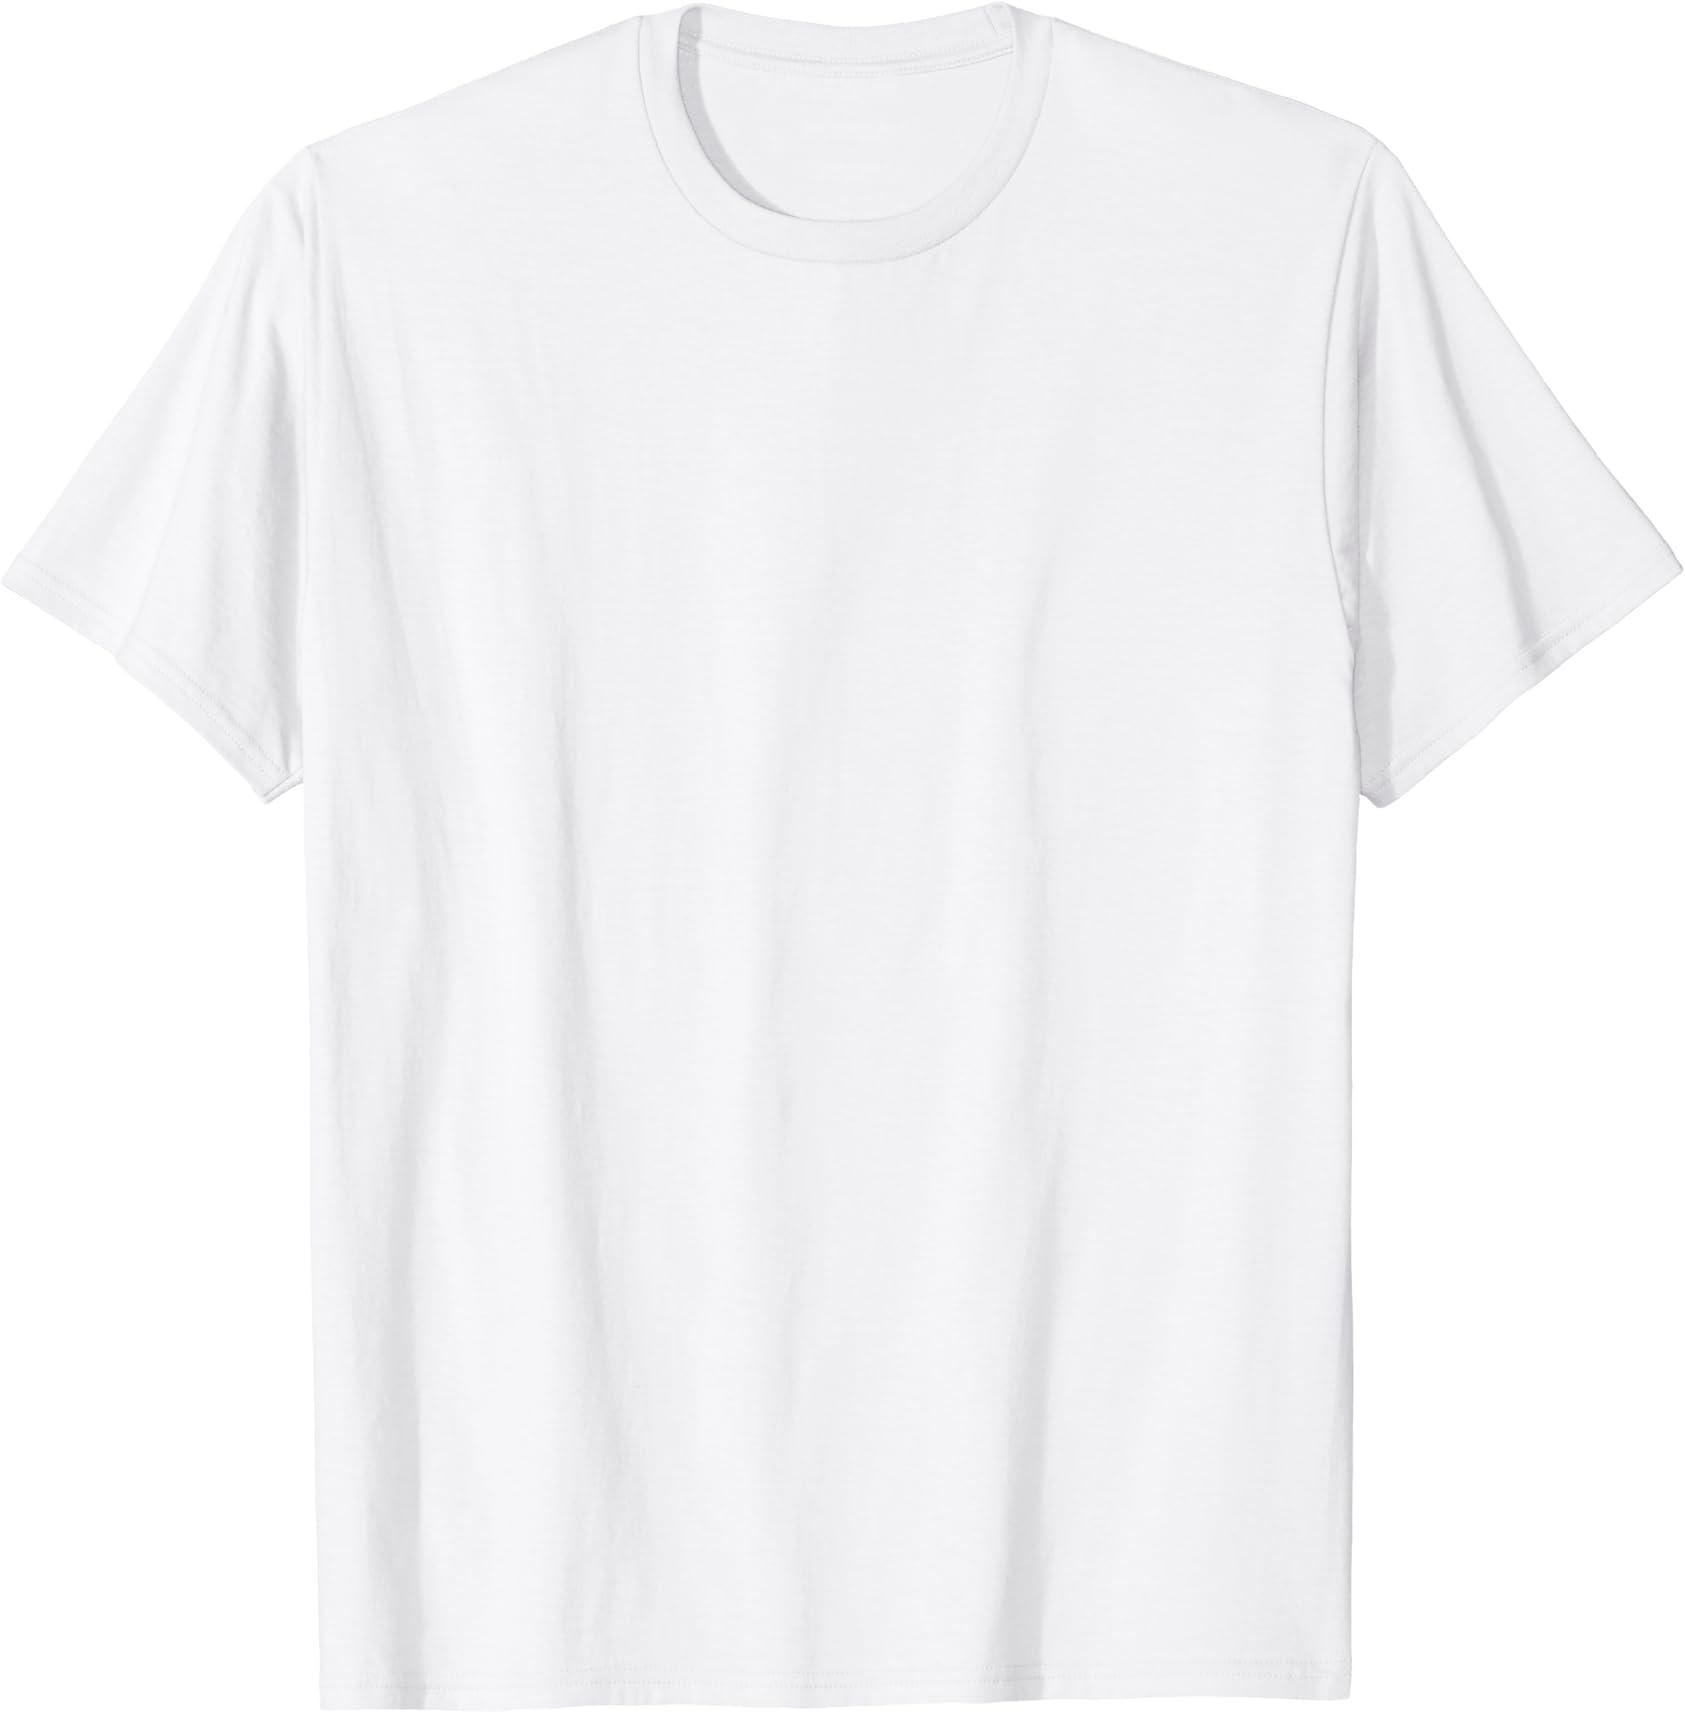 Gemini T-shirt Funny Astrology Zodiac Birthday Tee Shirt Astrology Gift